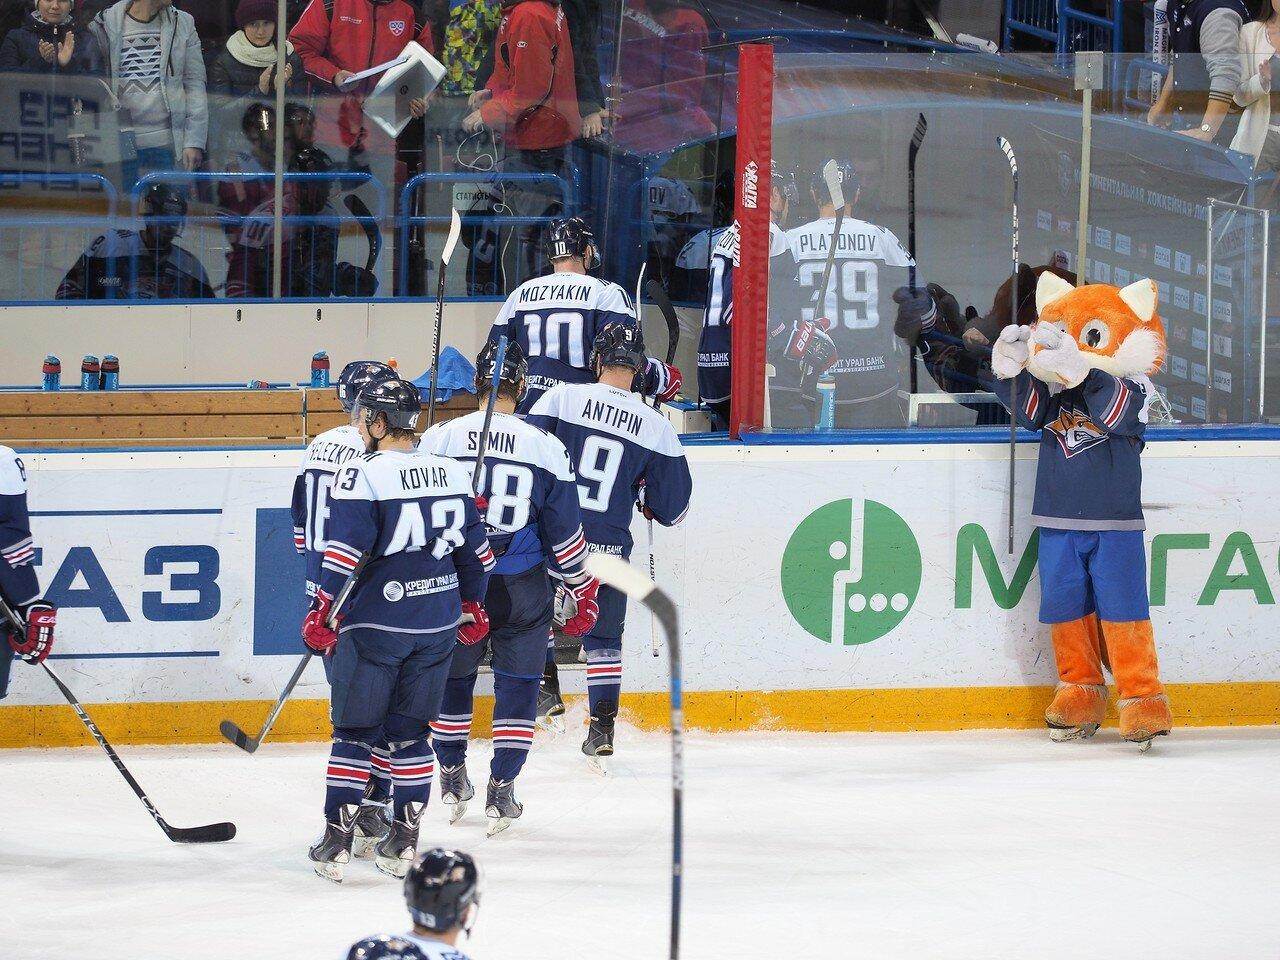 73Плей-офф 2016 Восток Финал Металлург - Салават Юлаев 25.03.2016